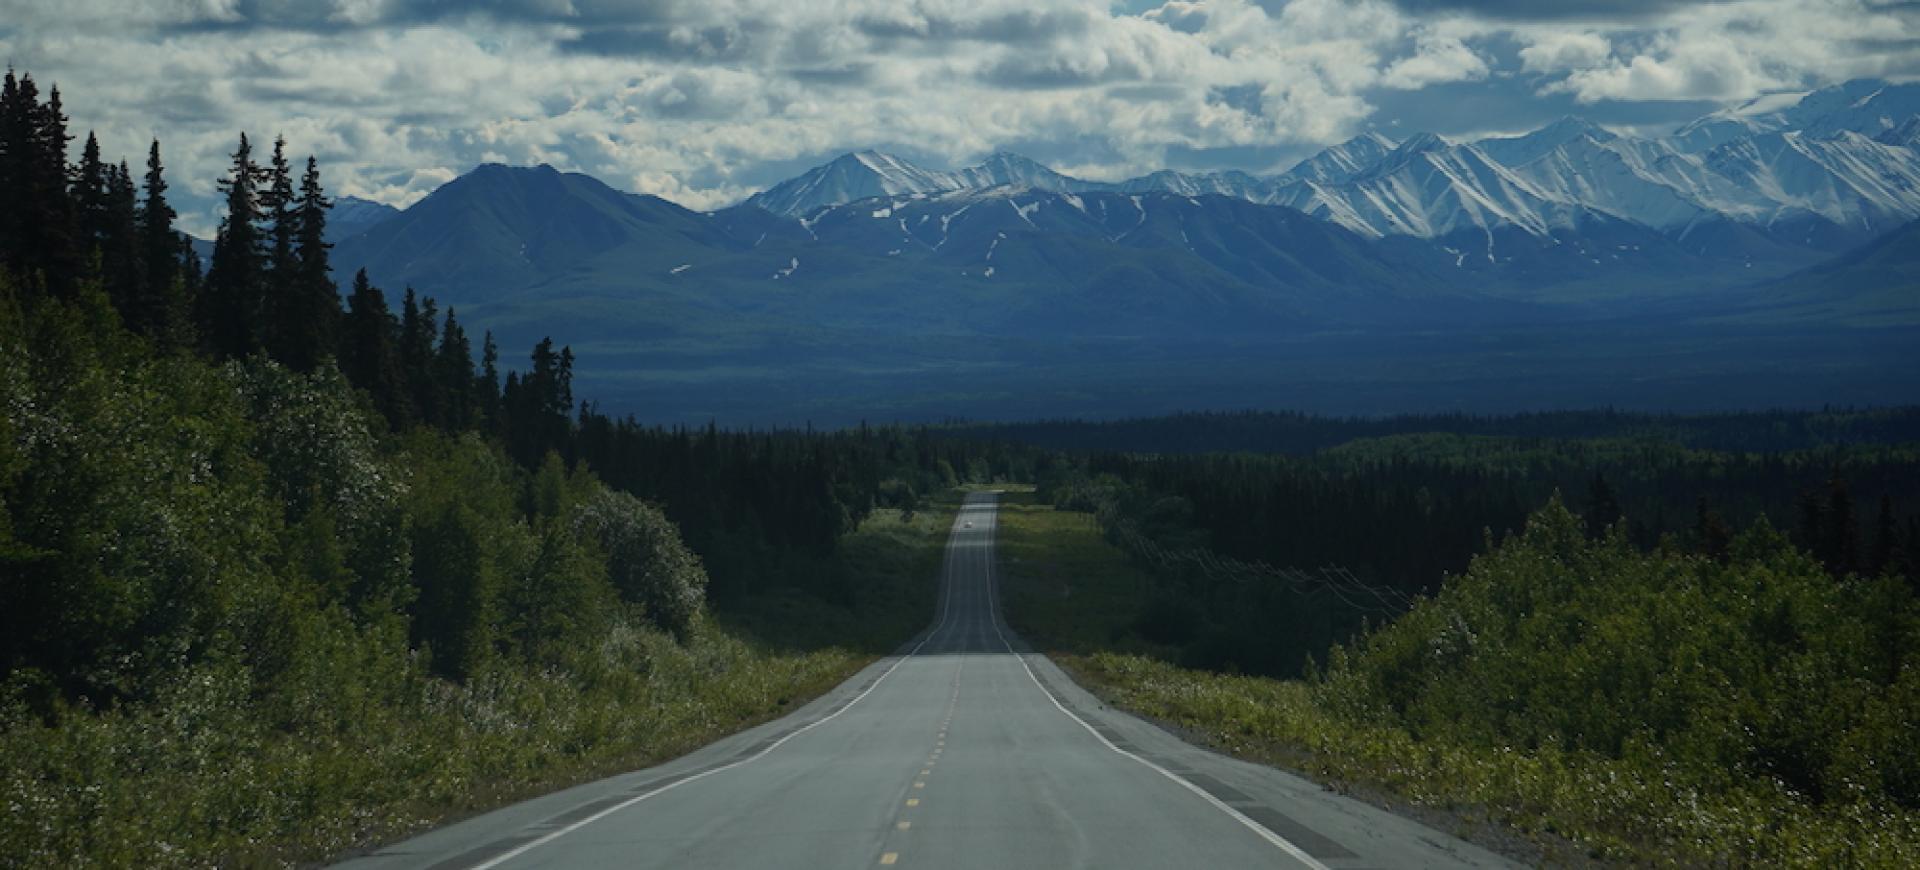 self-drive alaska wycieczka